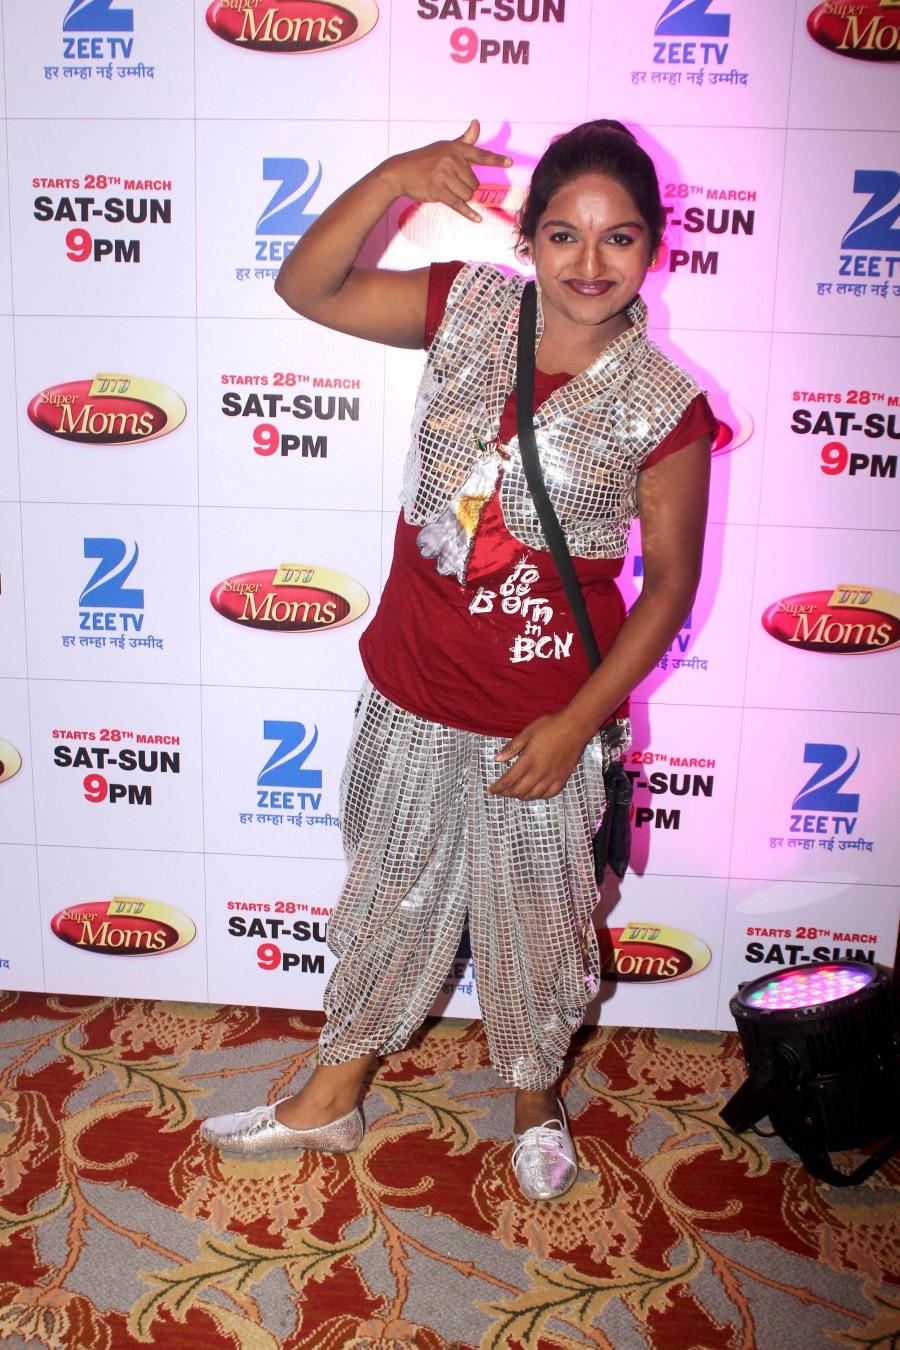 Govinda,Geeta kapoor,Karan wahi,DID super mom,Dance India Dance,Dance India Dance Super Mom,Zee TV show,Reality show,Dance India Dance Super Mom launch photos